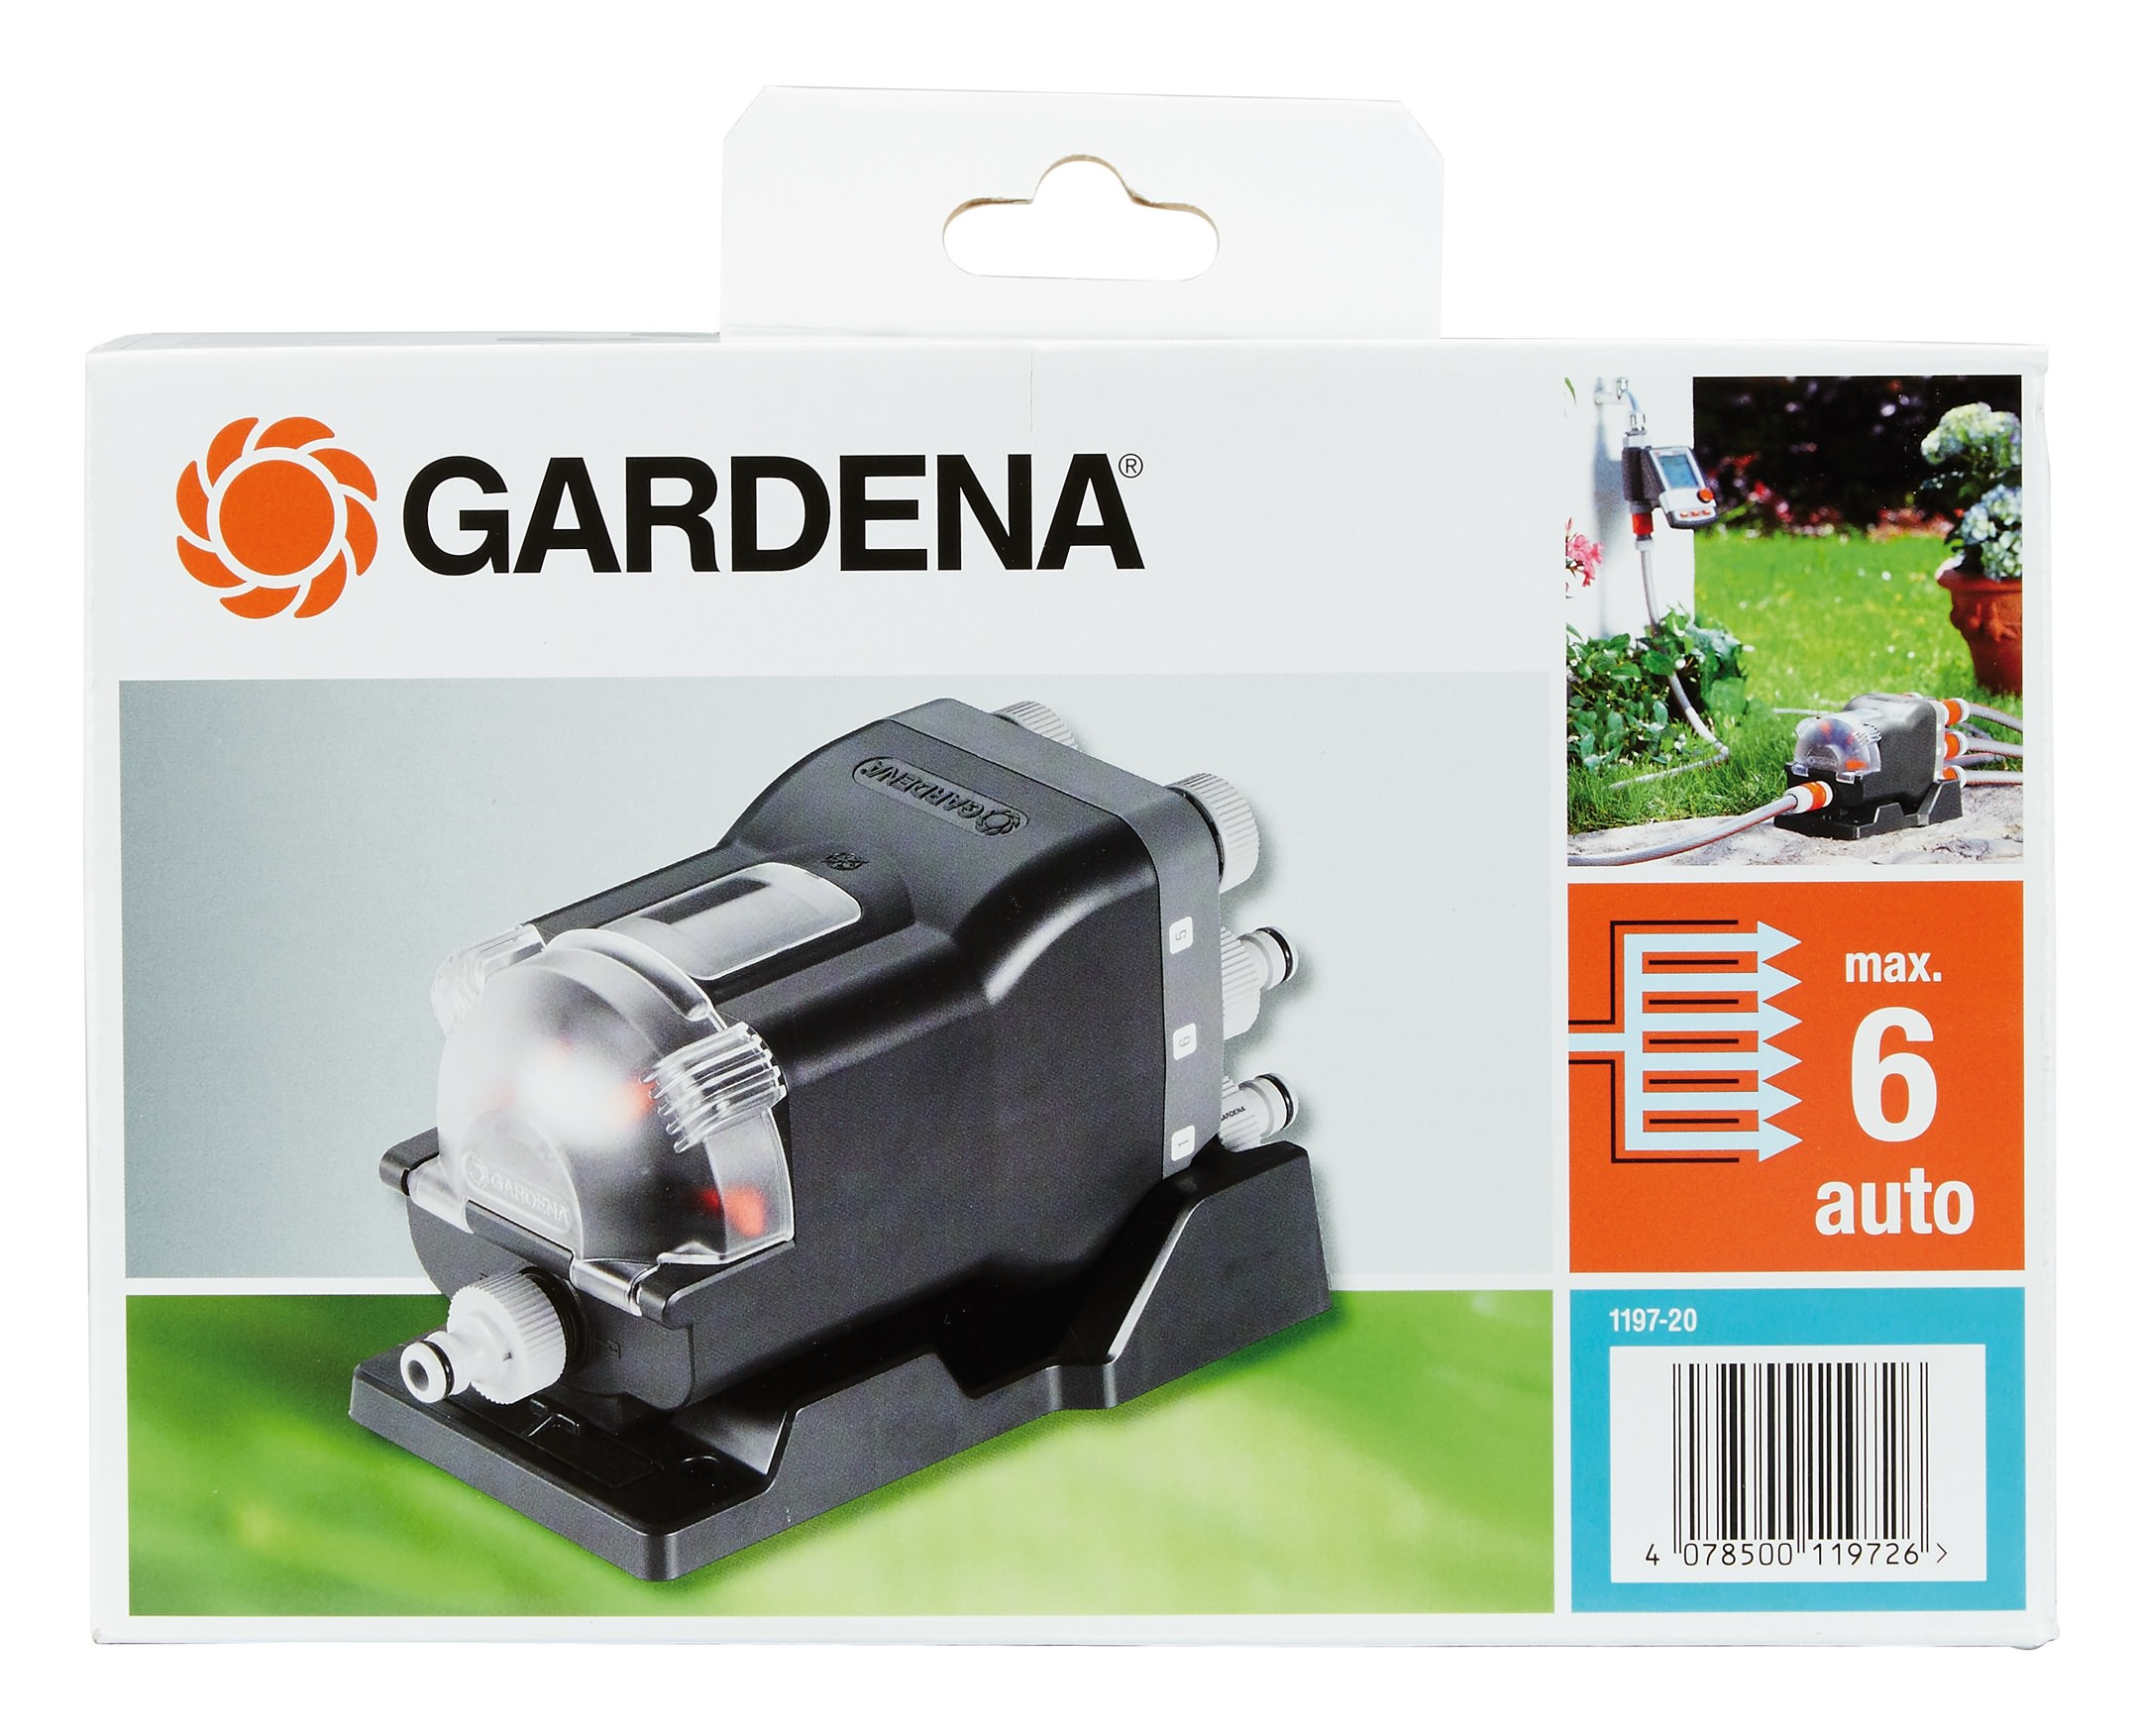 gardena wasserverteiler automatic 1197 20 01197 20. Black Bedroom Furniture Sets. Home Design Ideas